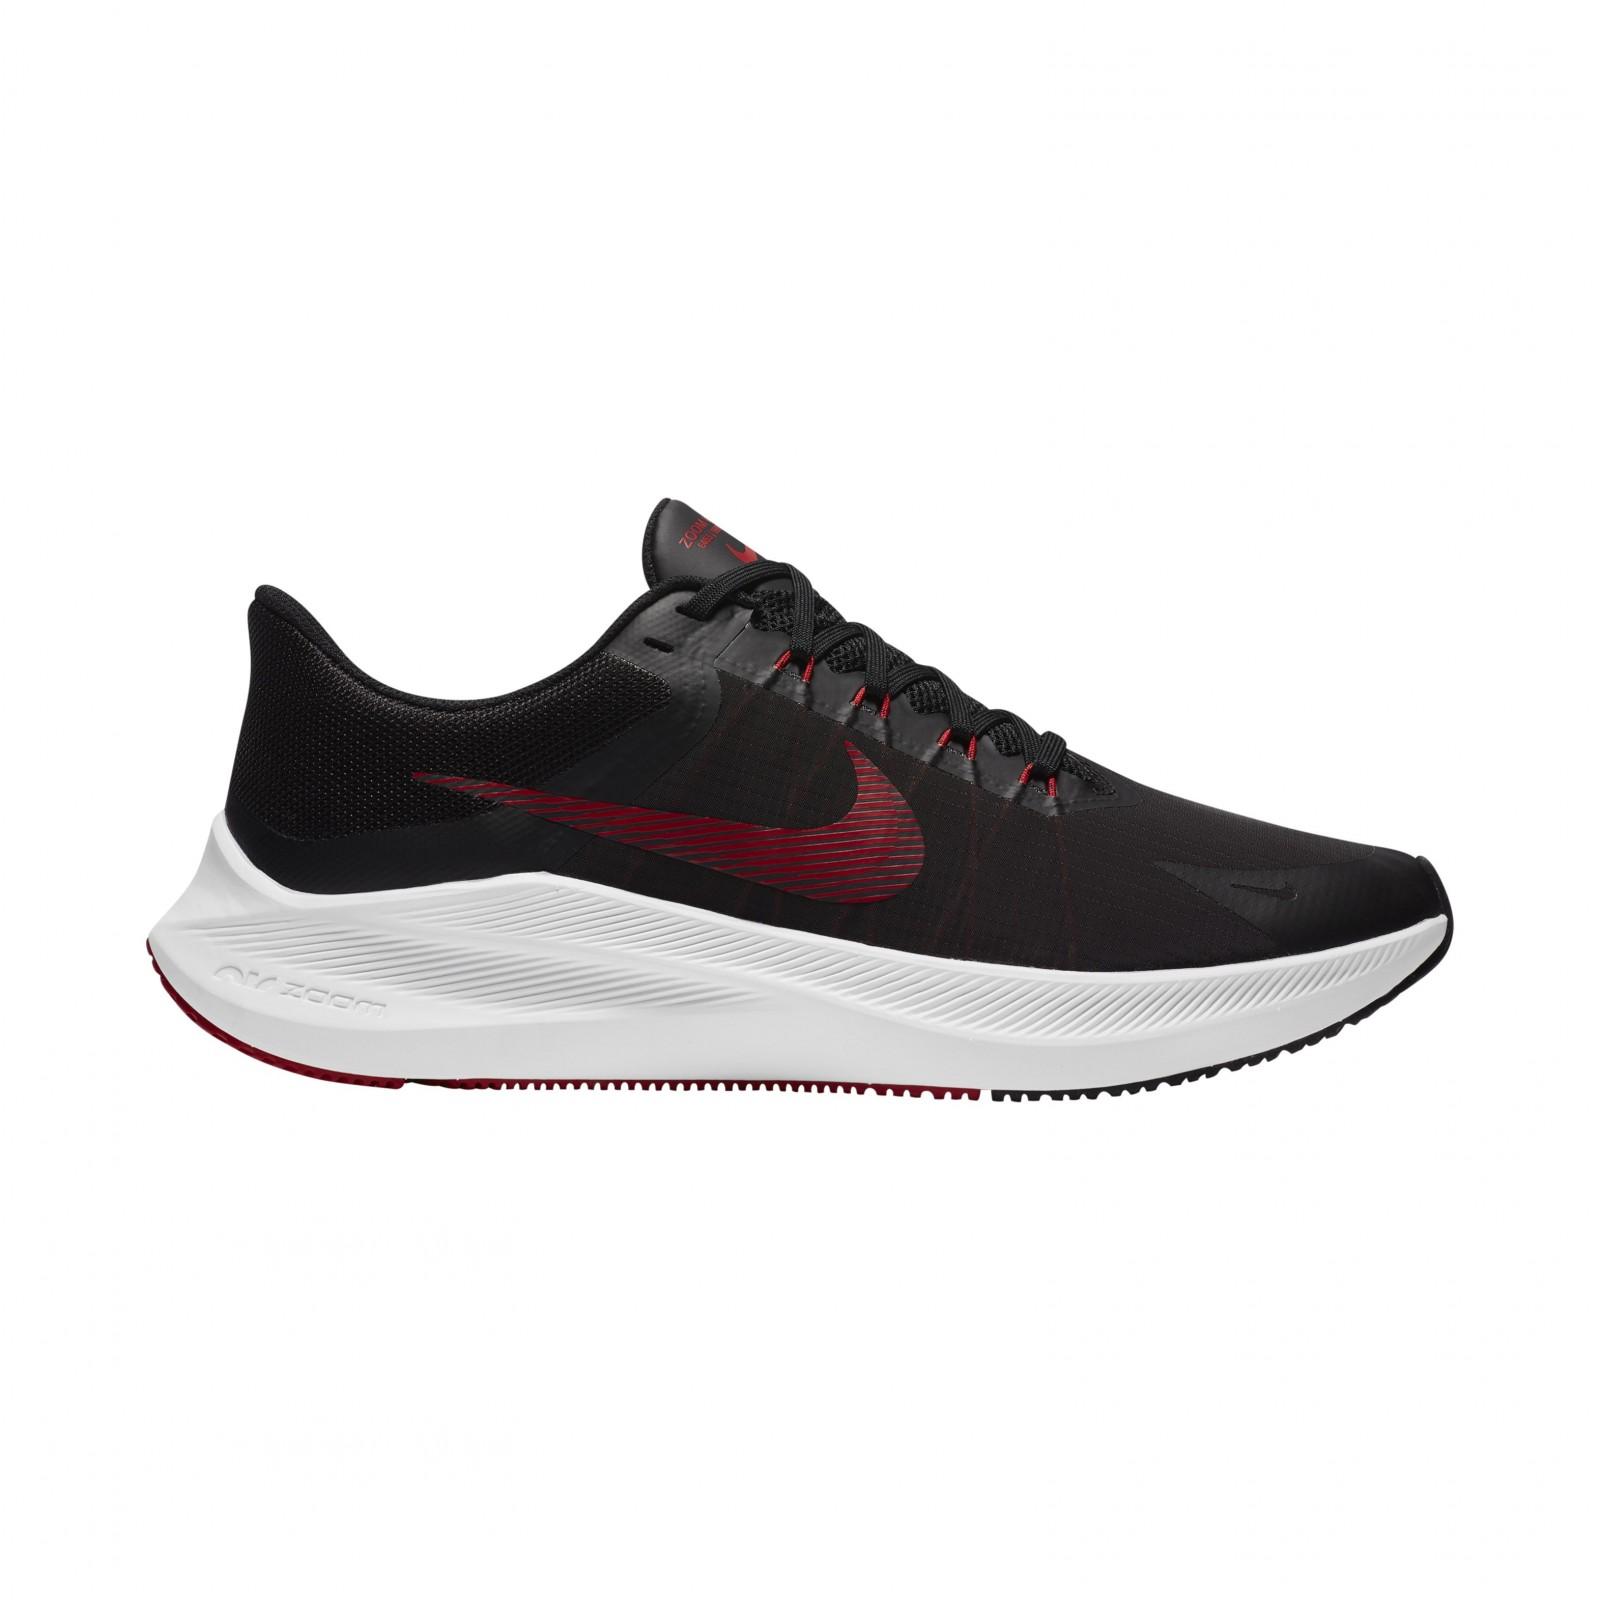 Nike Winflo 8 BLACK/UNIVERSITY RED-LT SMOKE GREY-WHITE